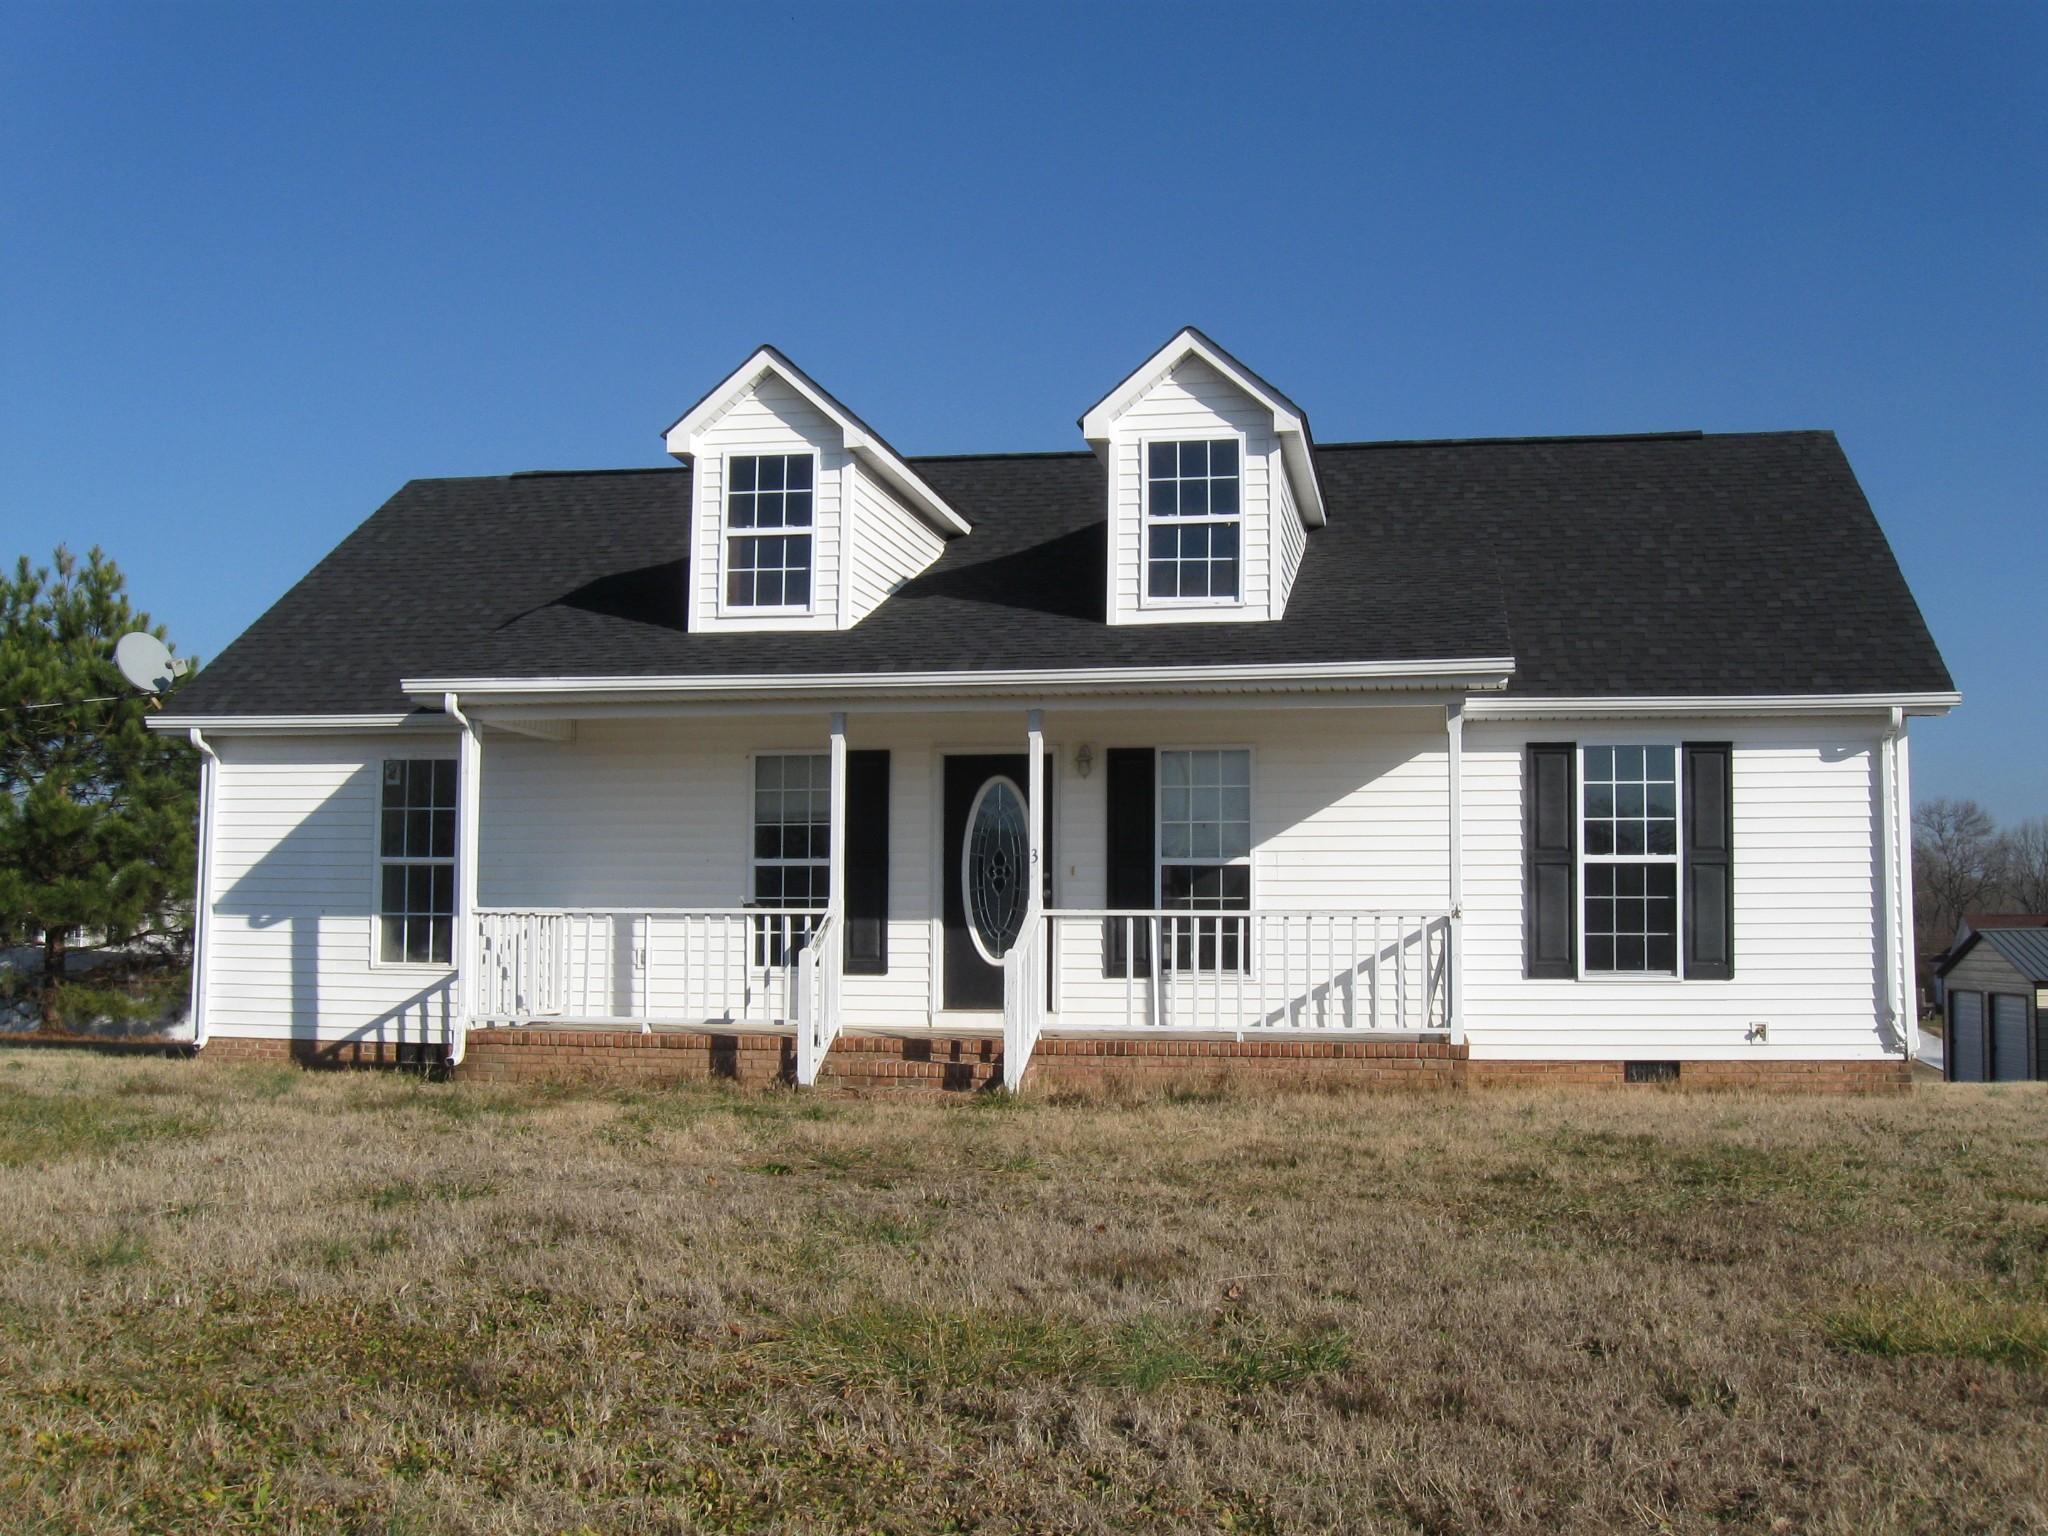 39 Ridgeline Dr Property Photo - Fayetteville, TN real estate listing